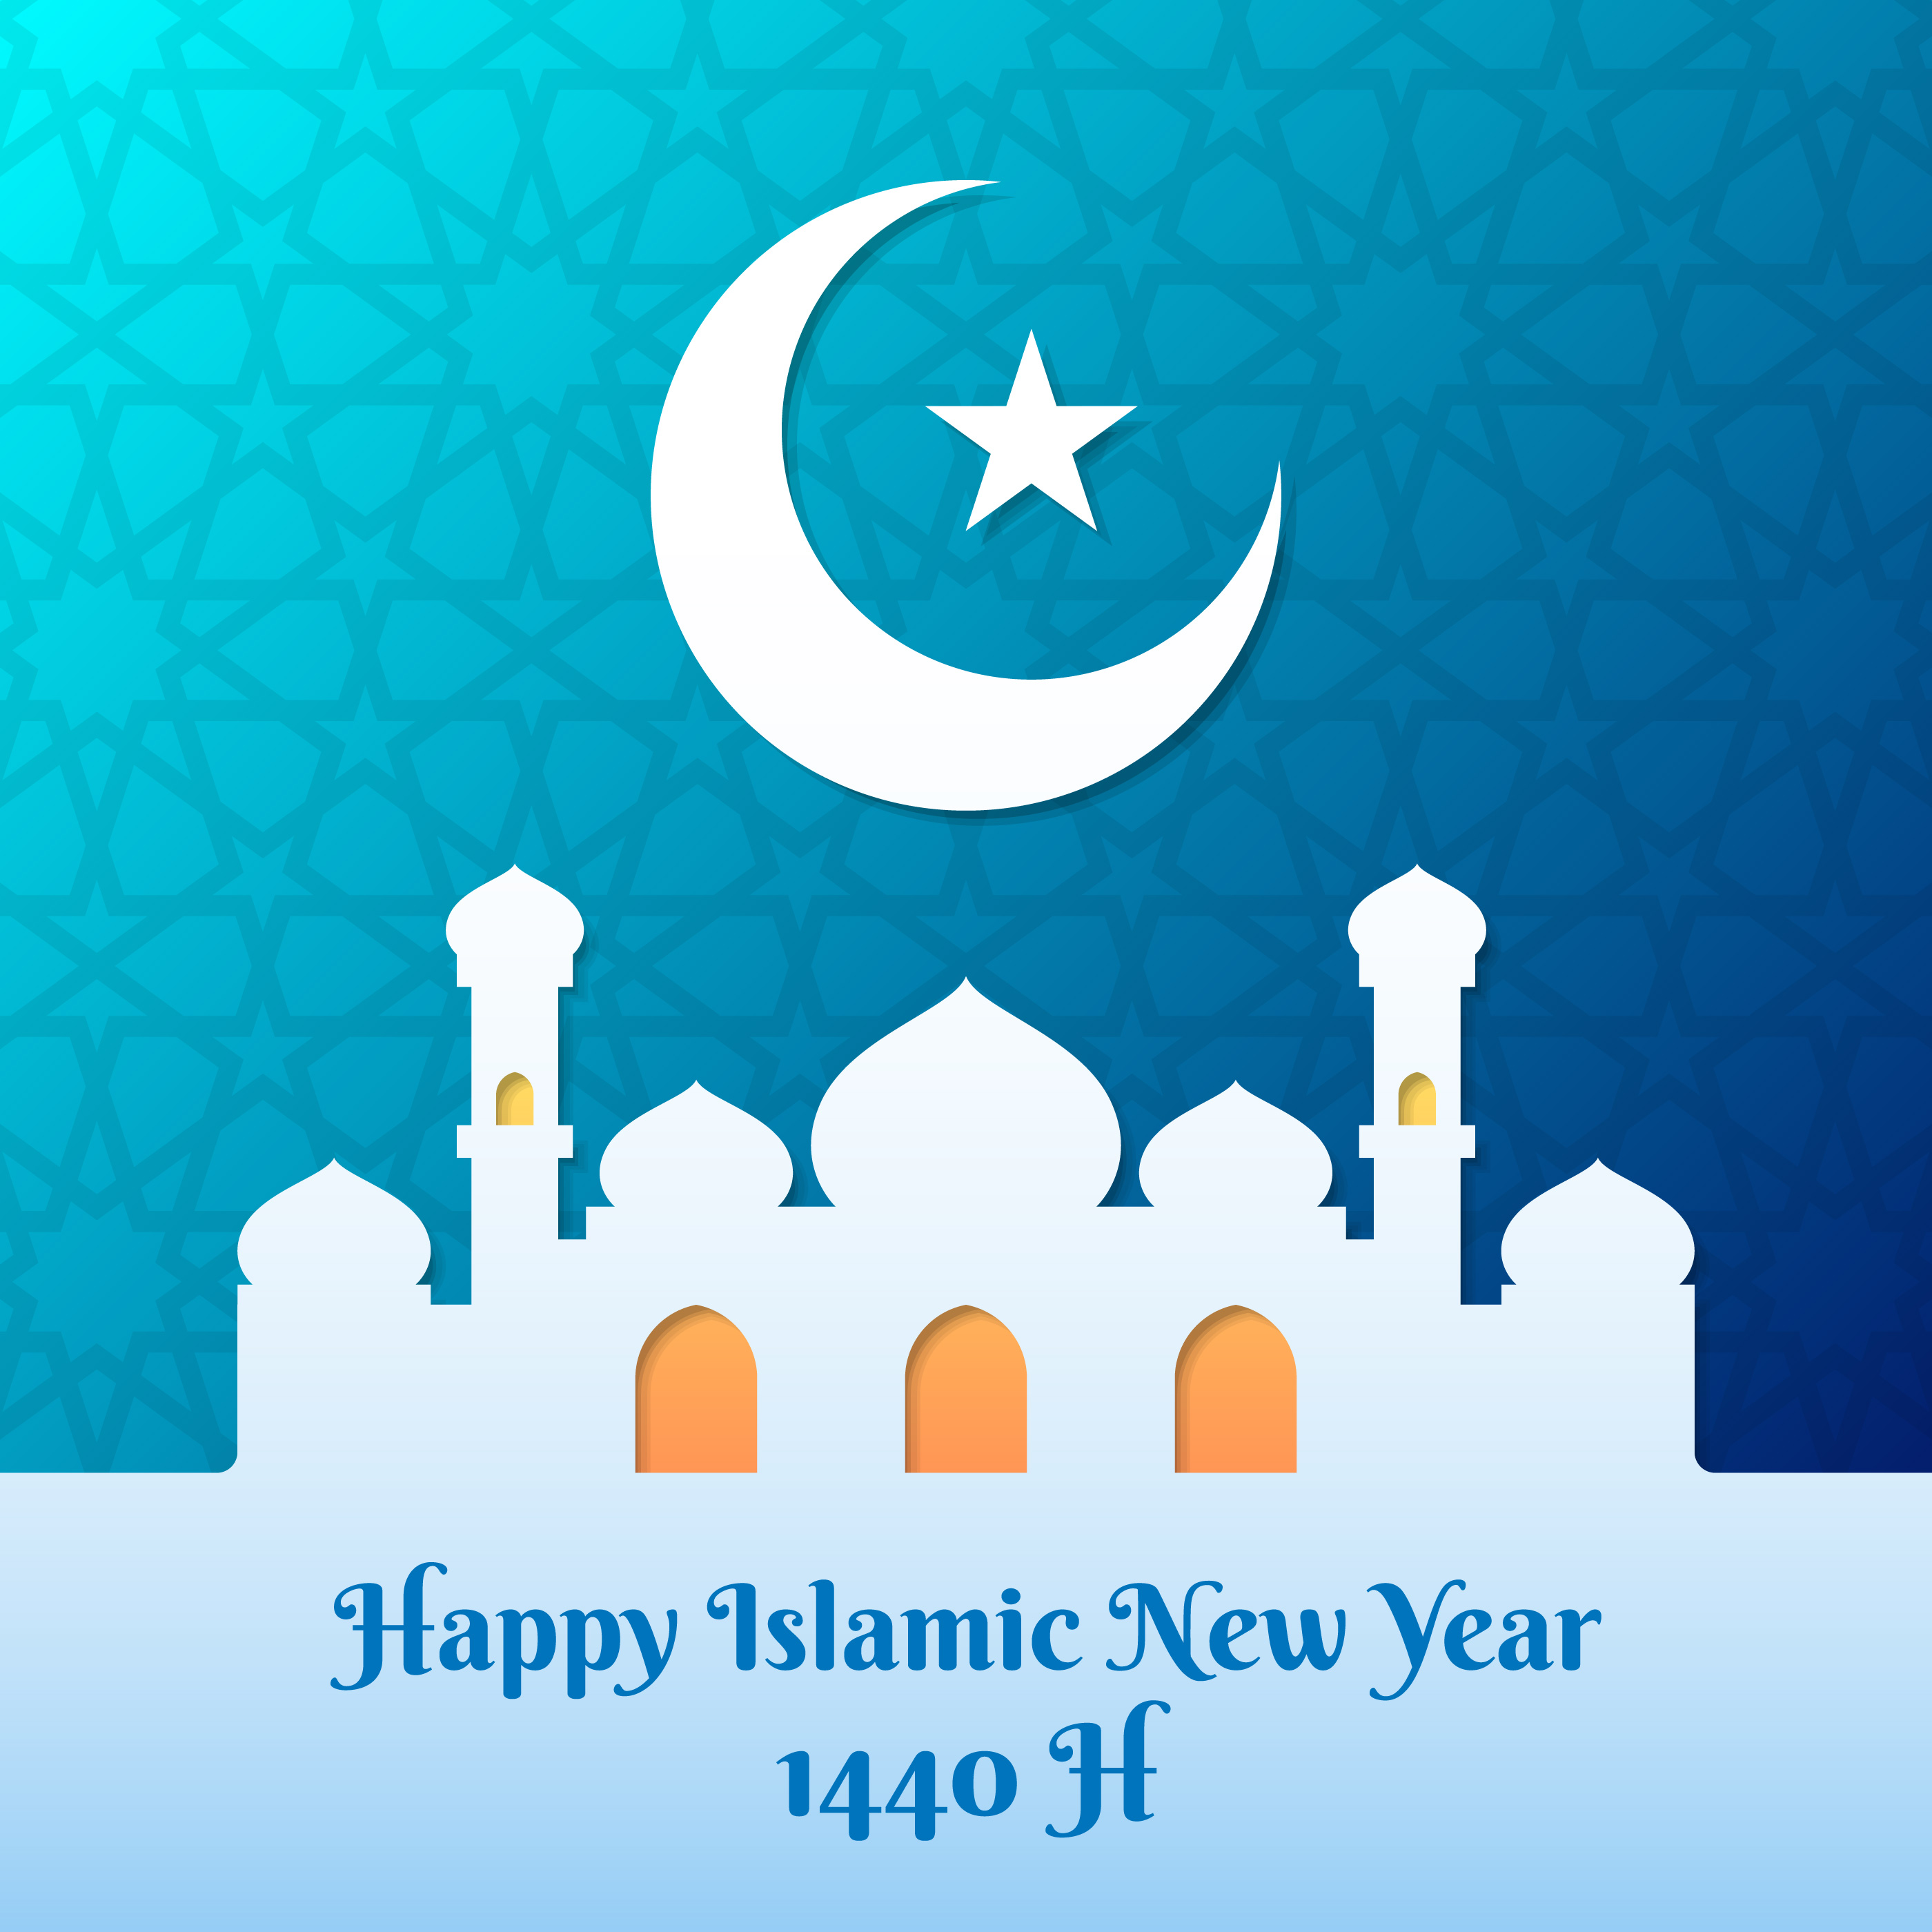 Happy New Hijri Year 1440h Illustration Download Free Vector Art